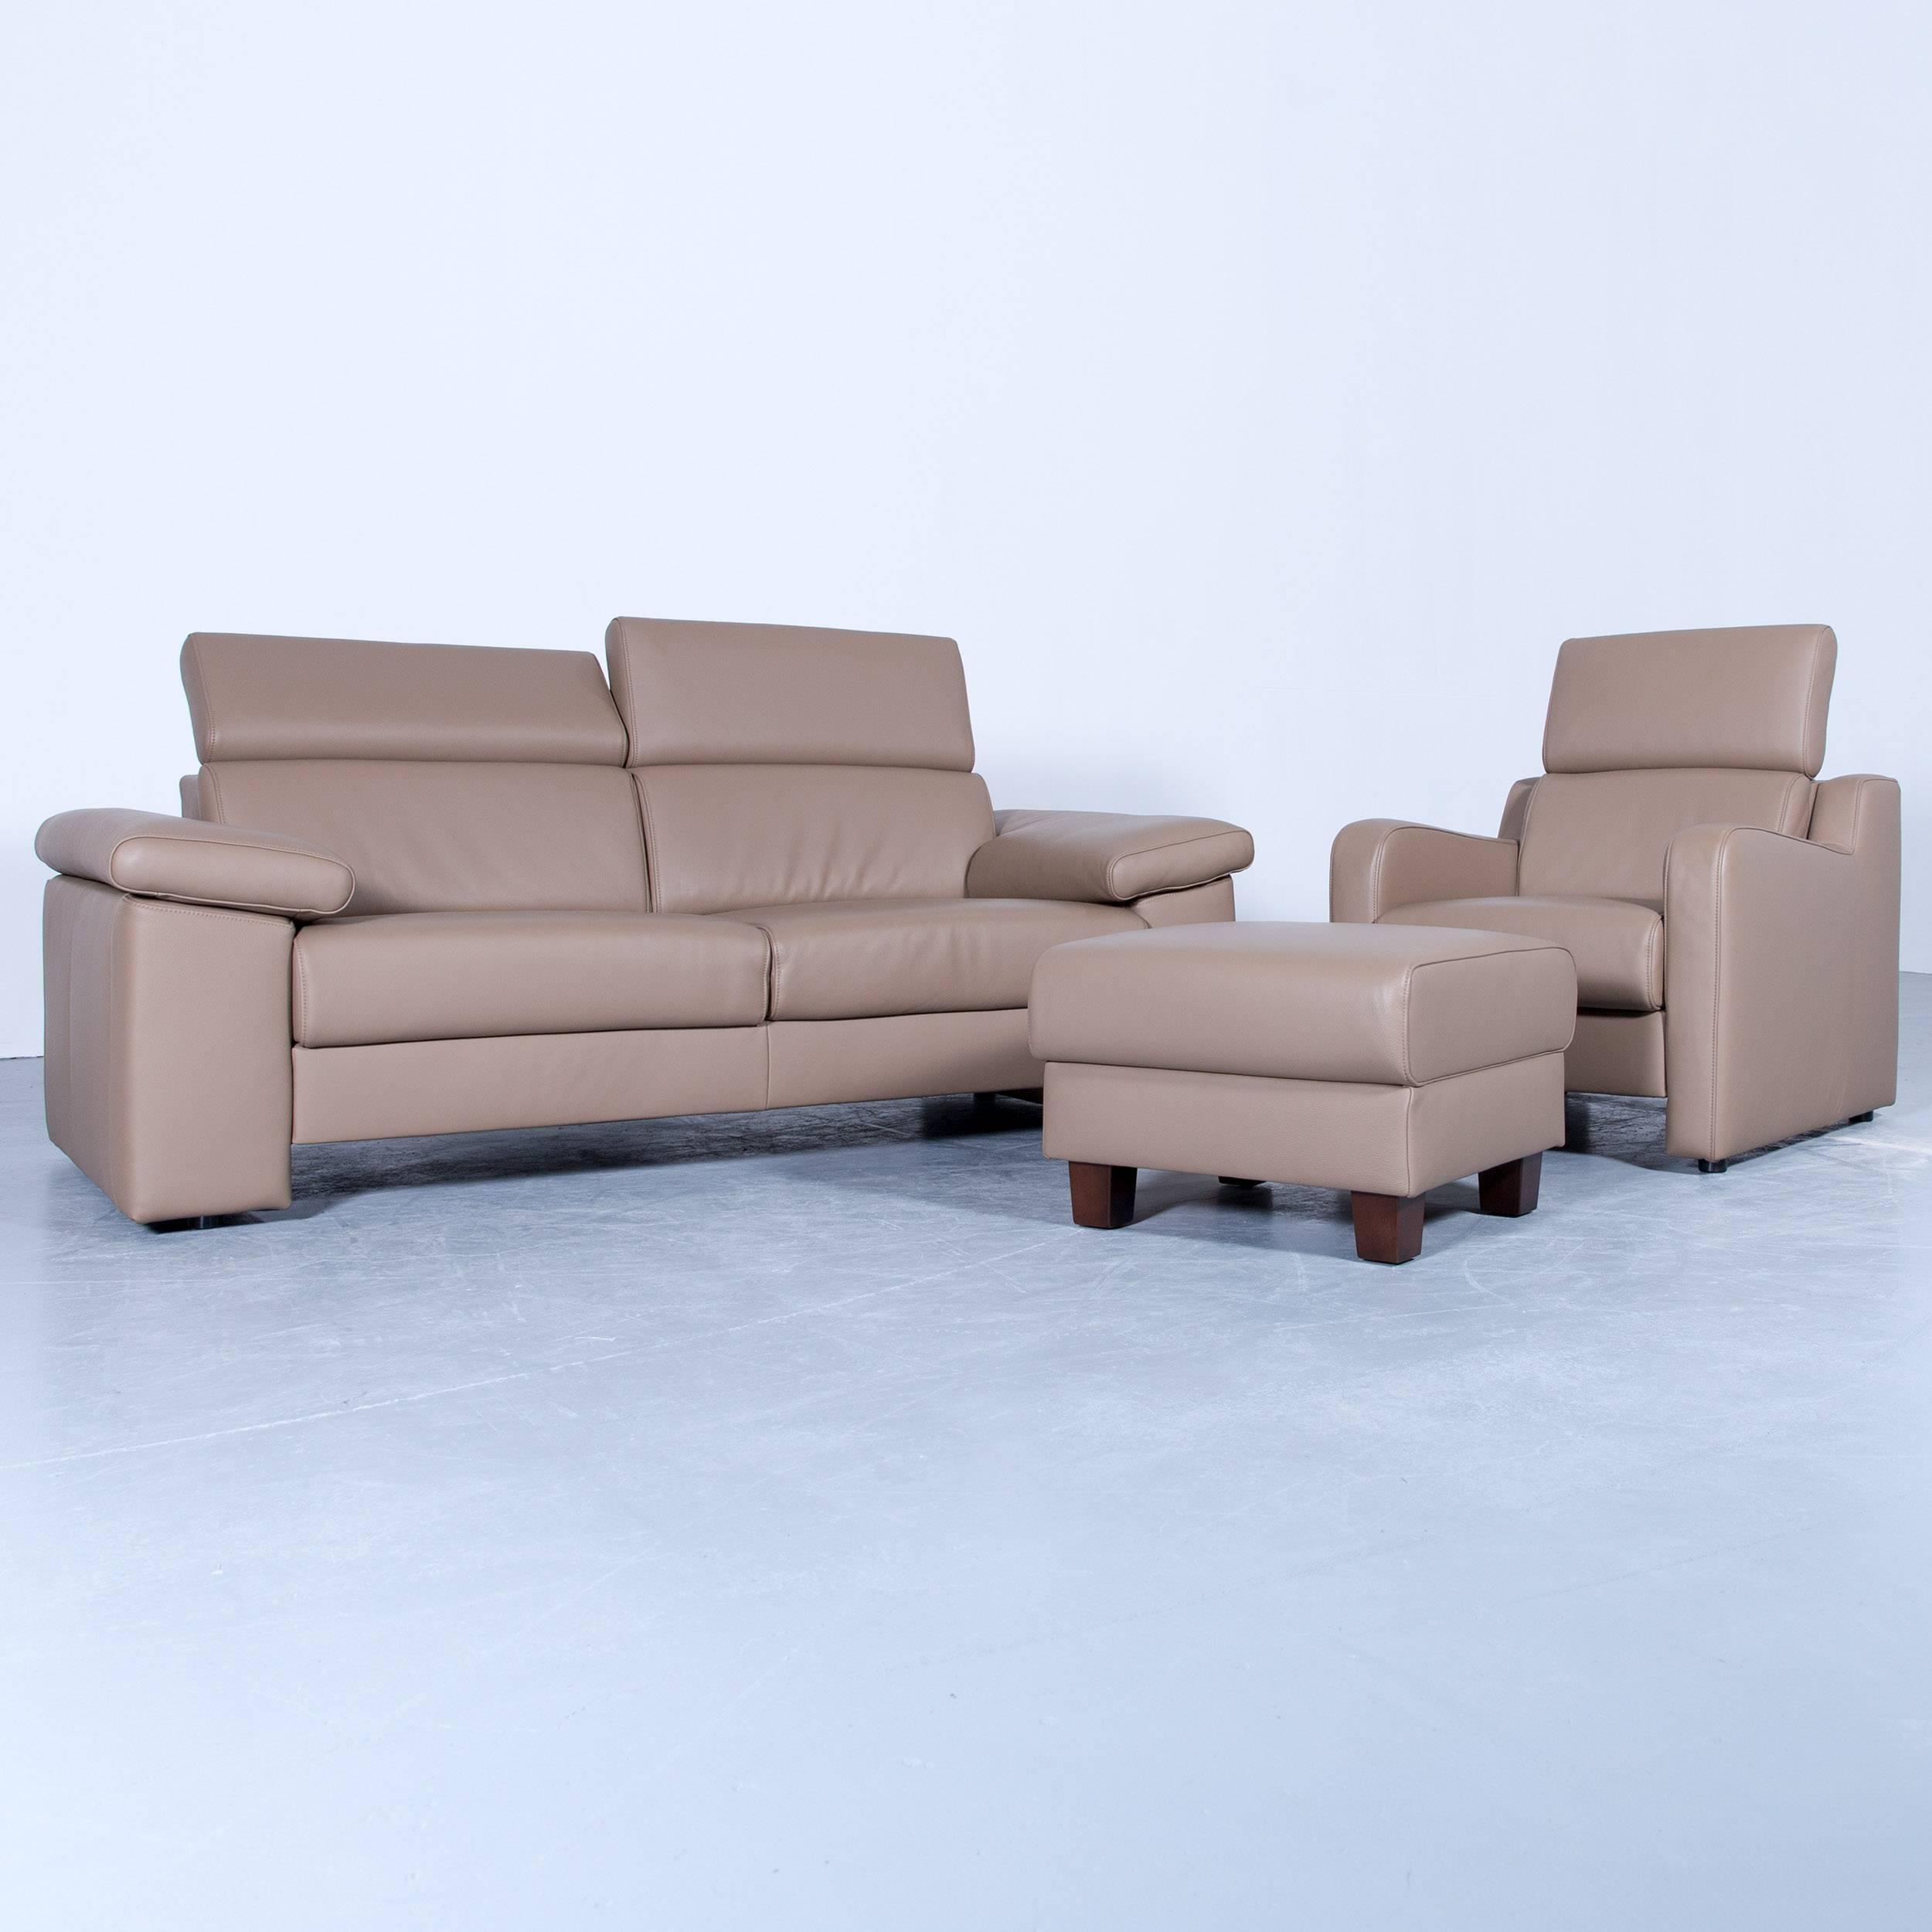 Akau0027dor Designer Sofa, Armchair, Footrest Leather Beige Brown Modern Wood  Feet For Nice Ideas